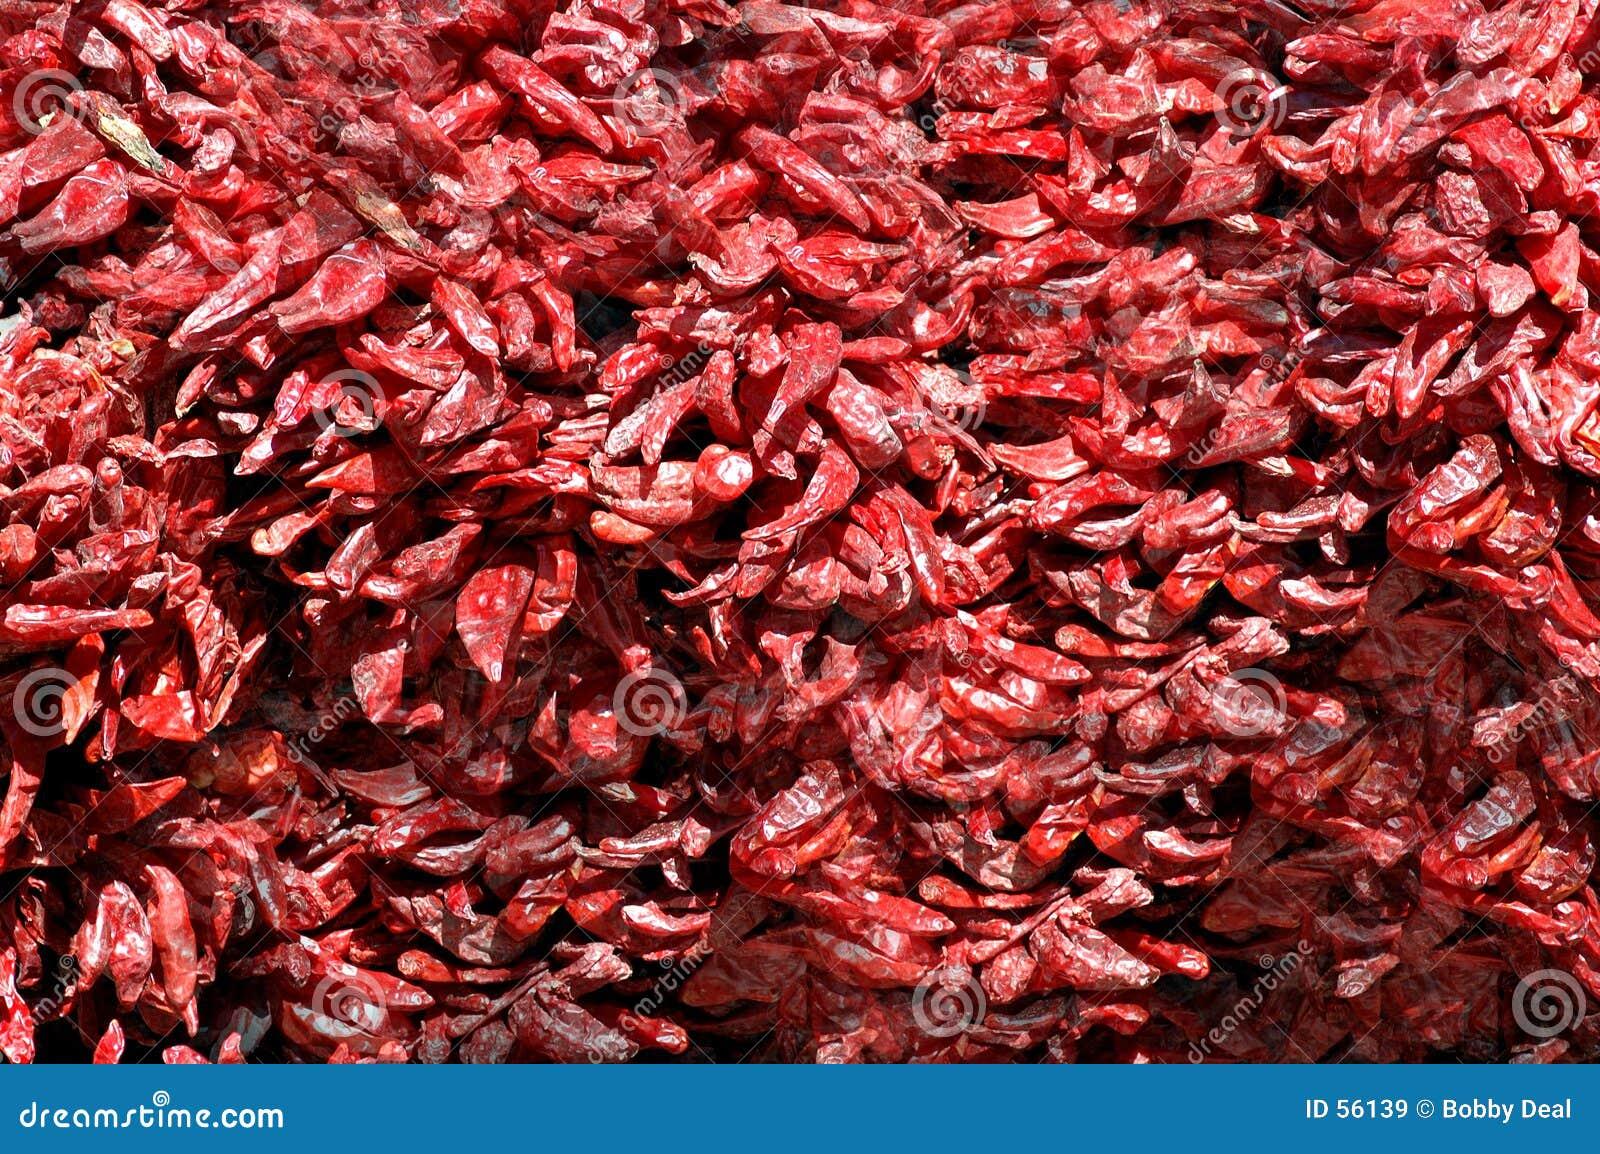 辣椒红色ristras